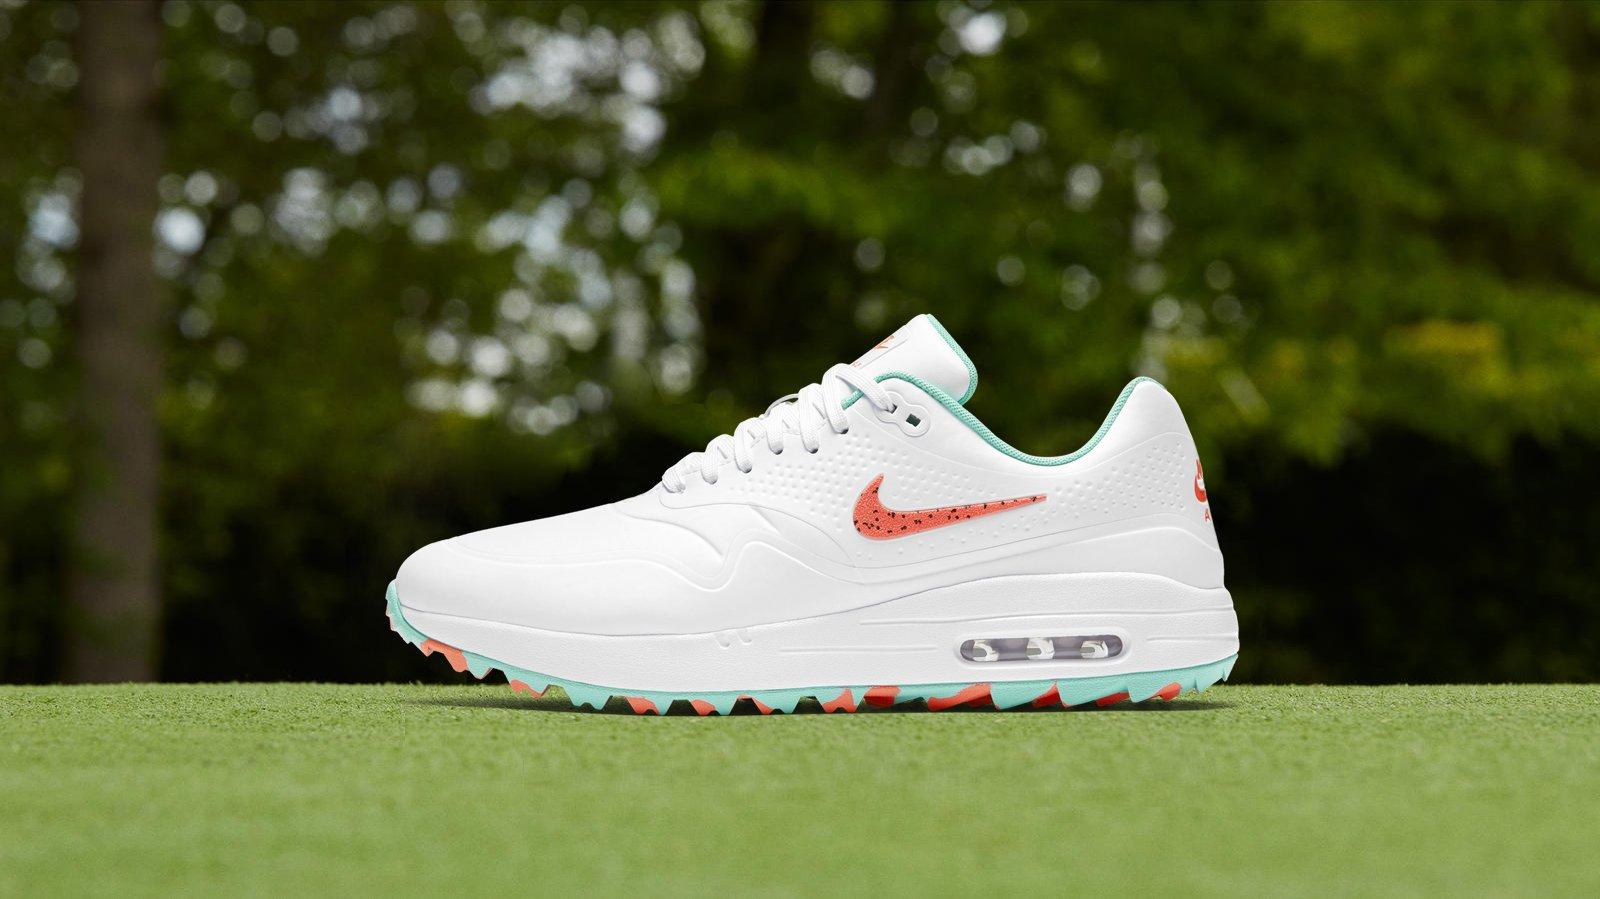 Golfposer On Twitter Restock Alert Nikegolf Air Max 1 G In White Hot Punch Aurora Green Shop Https T Co Waknvyw9w9